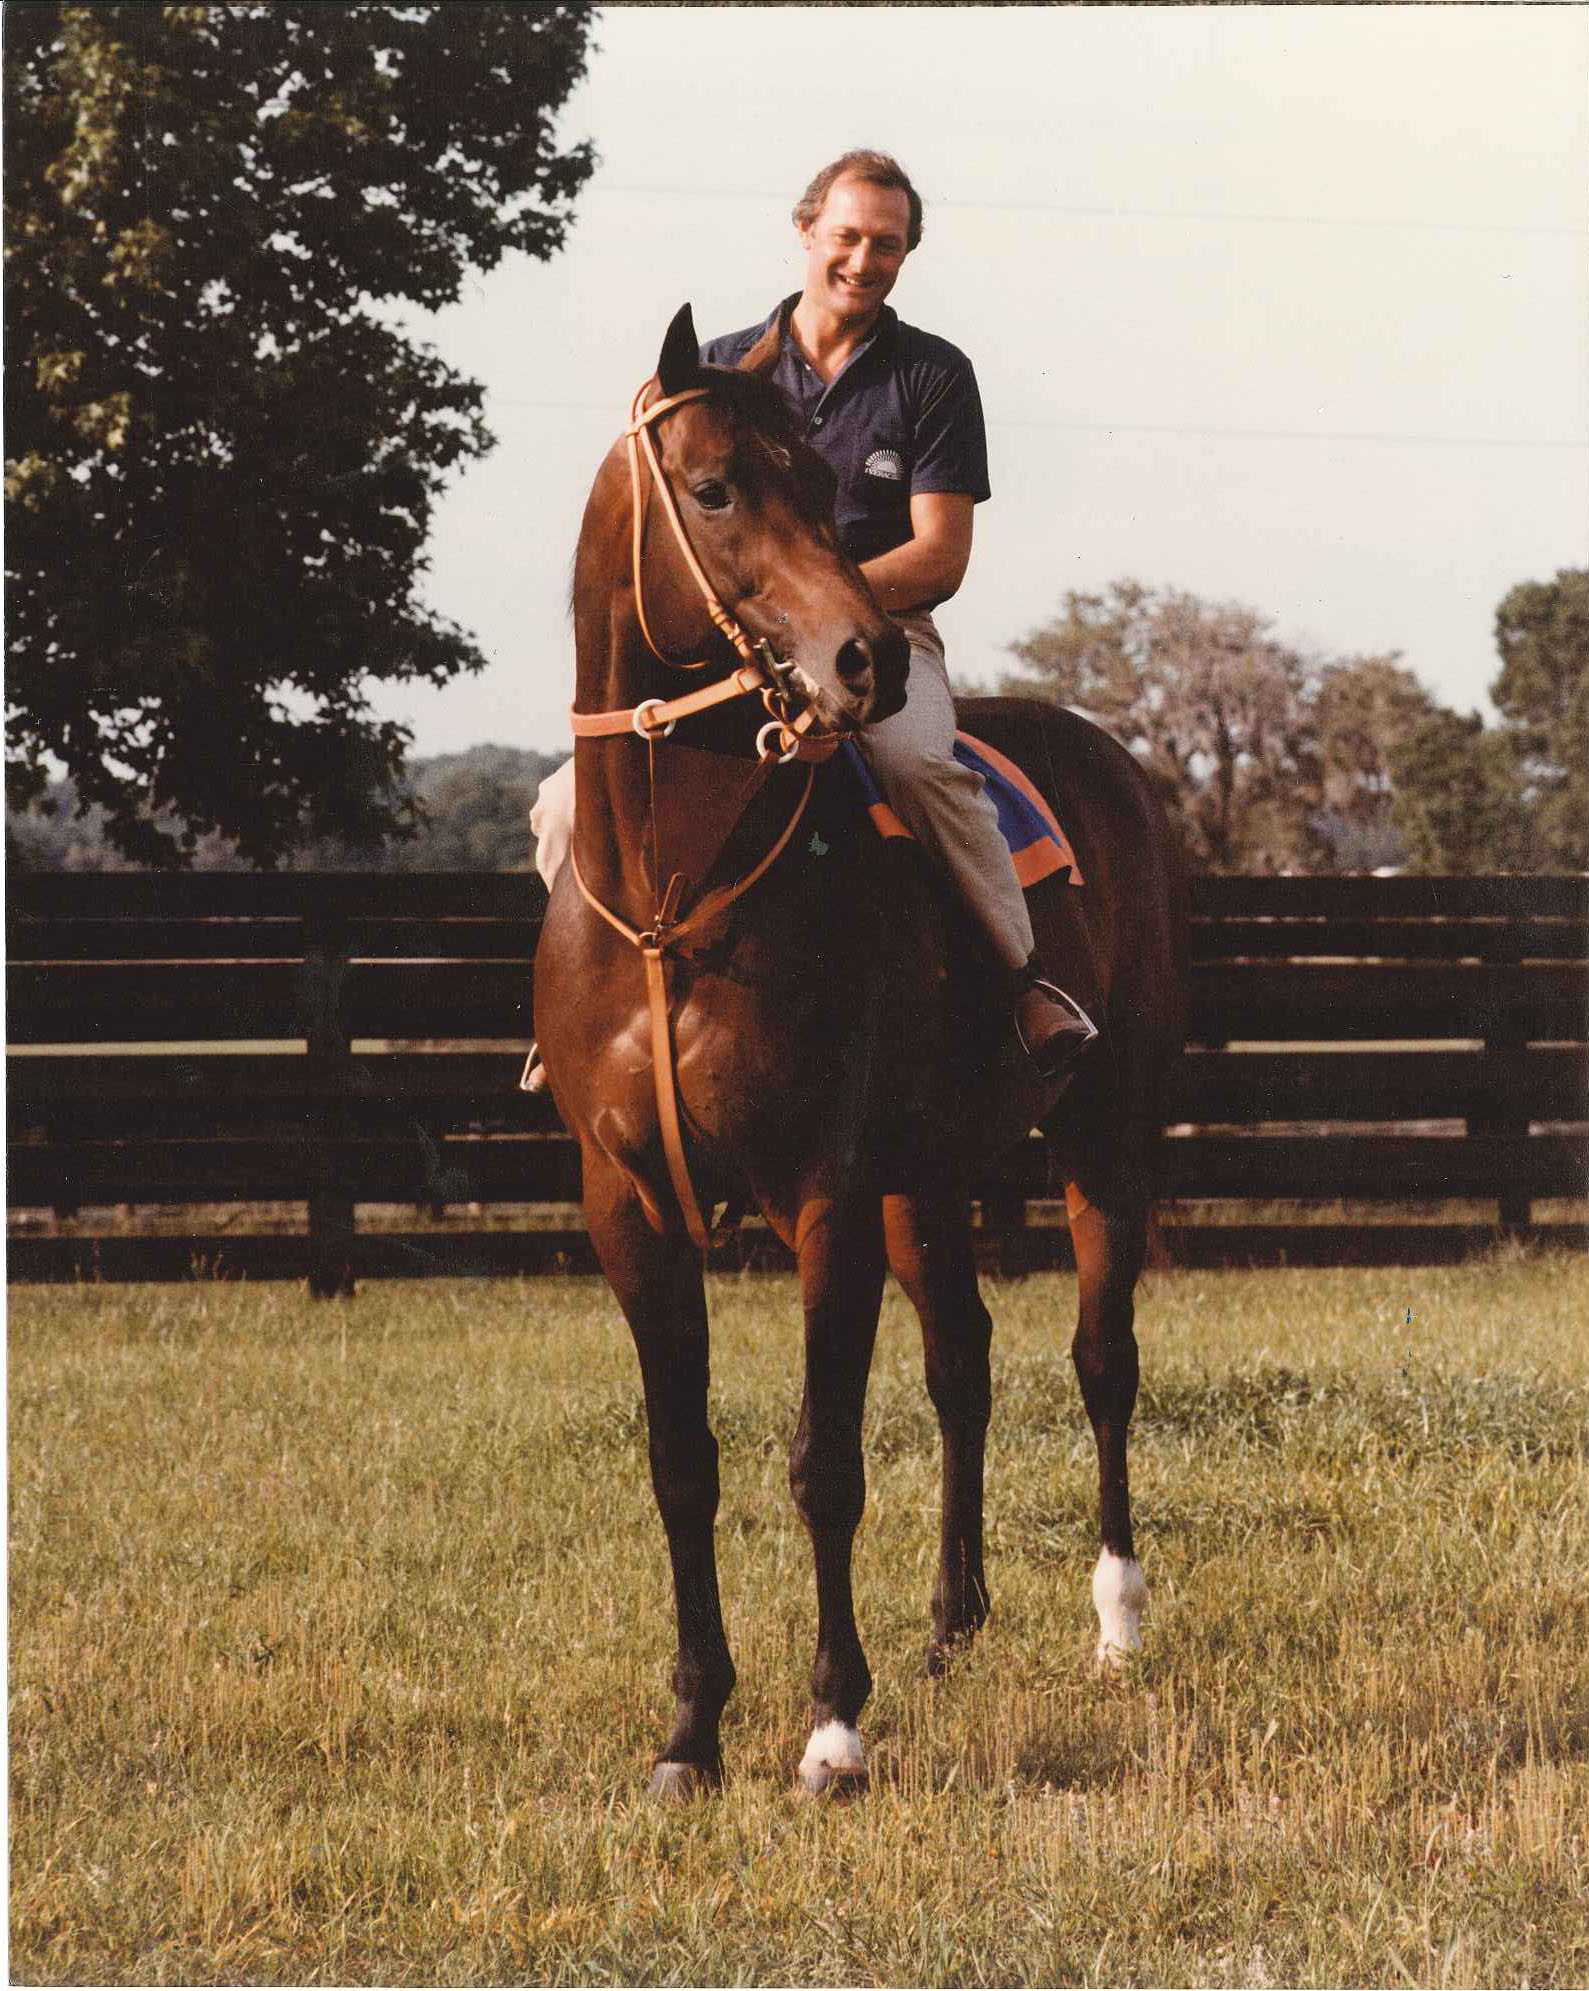 Roger Attfield on horseback (Woodbine Photo)